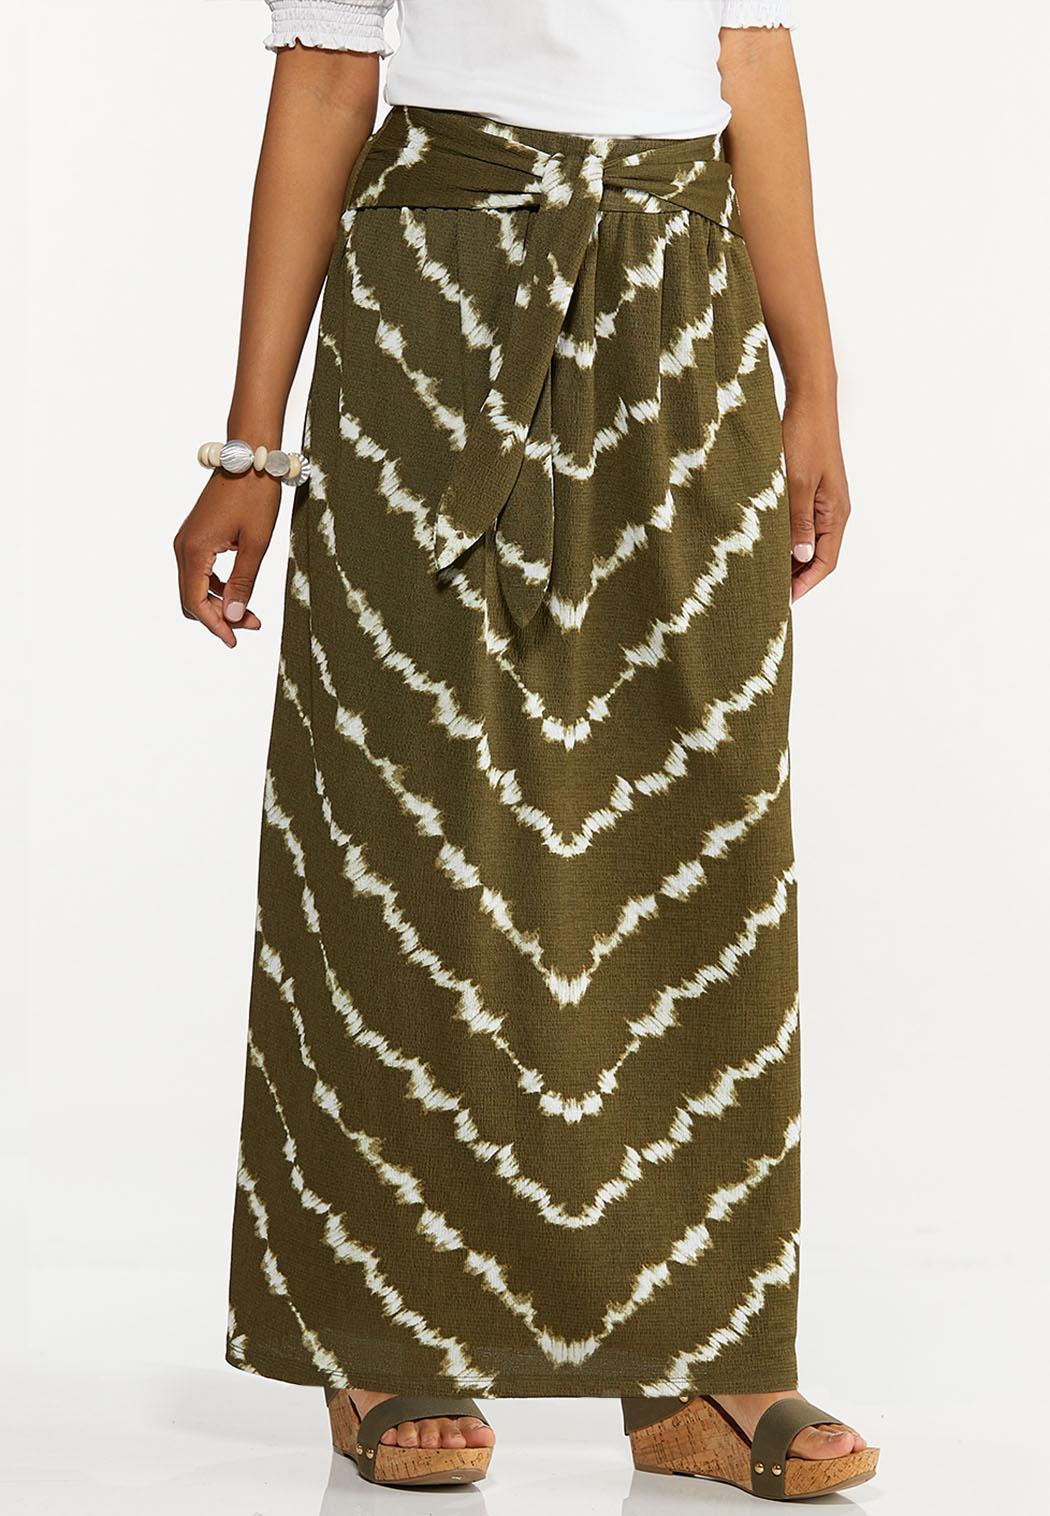 Plus Size Olive Tie Dye Maxi Skirt